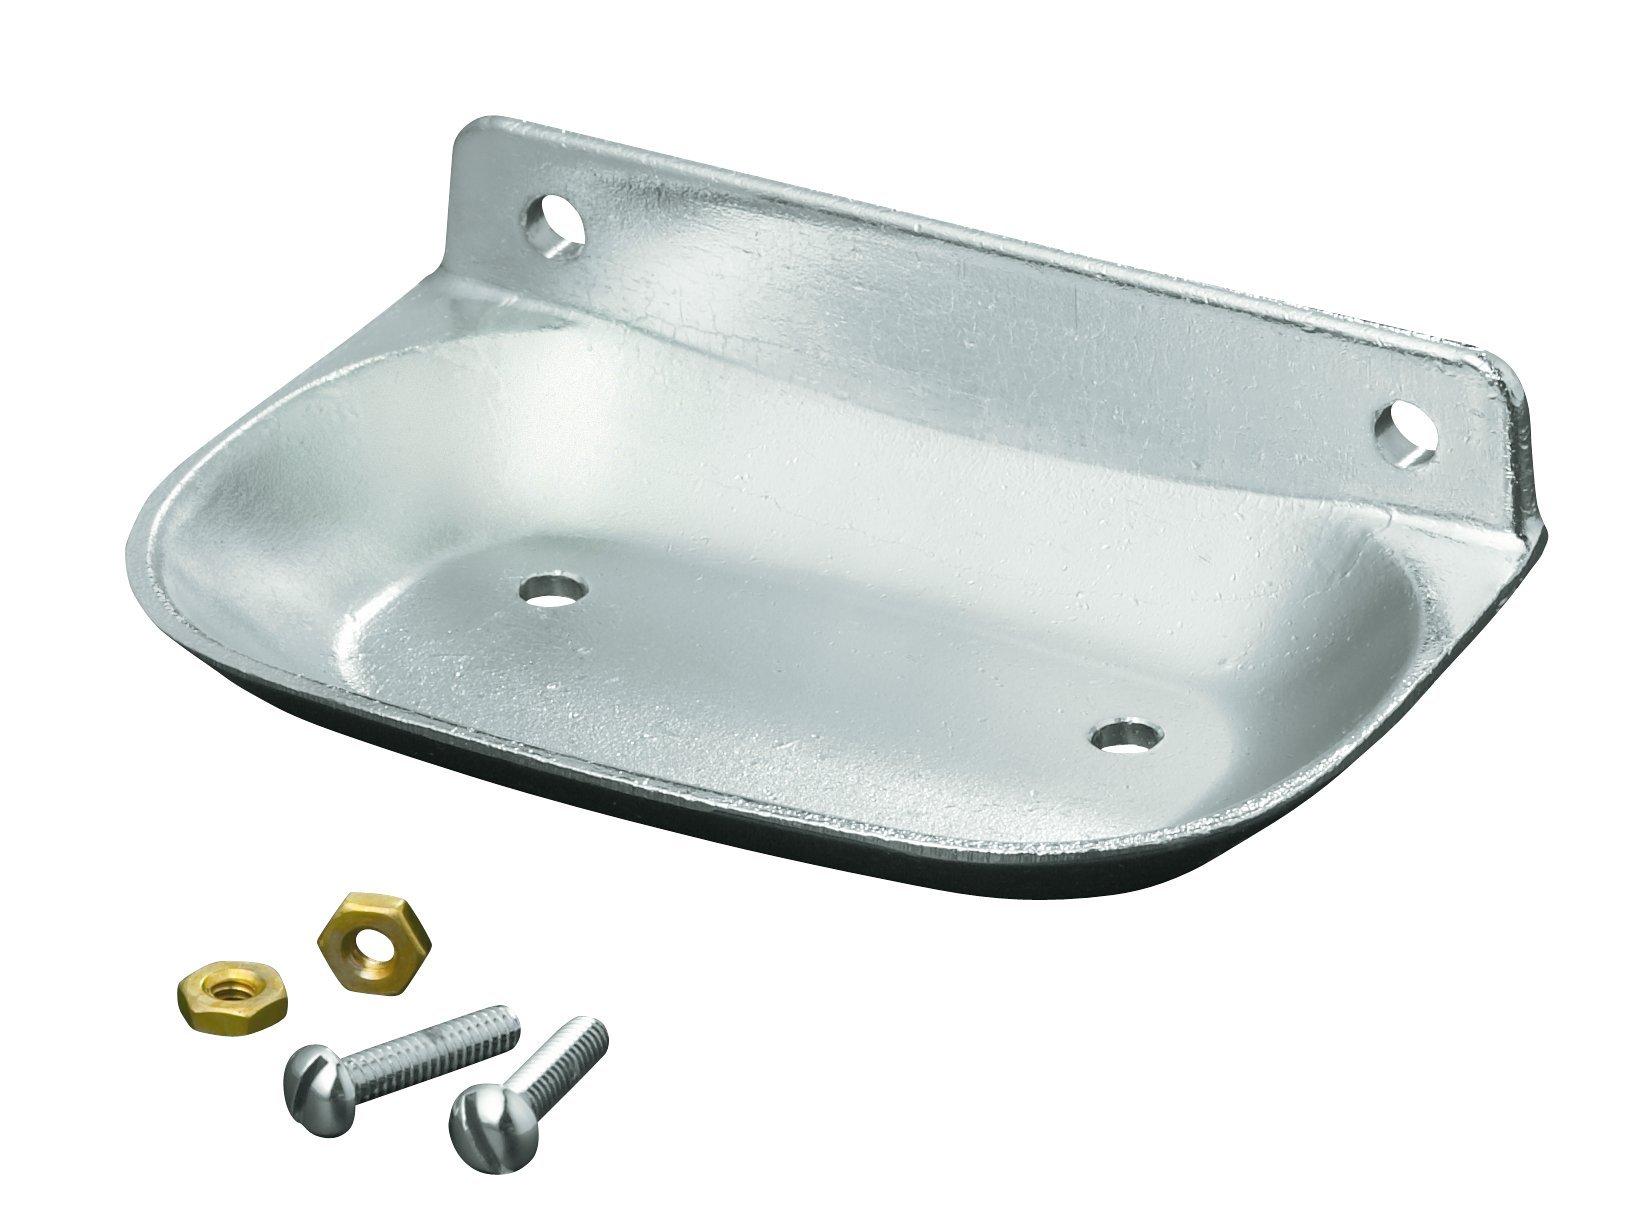 KOHLER K-8880-BC Brockway Soap Dish, Bright Chrome